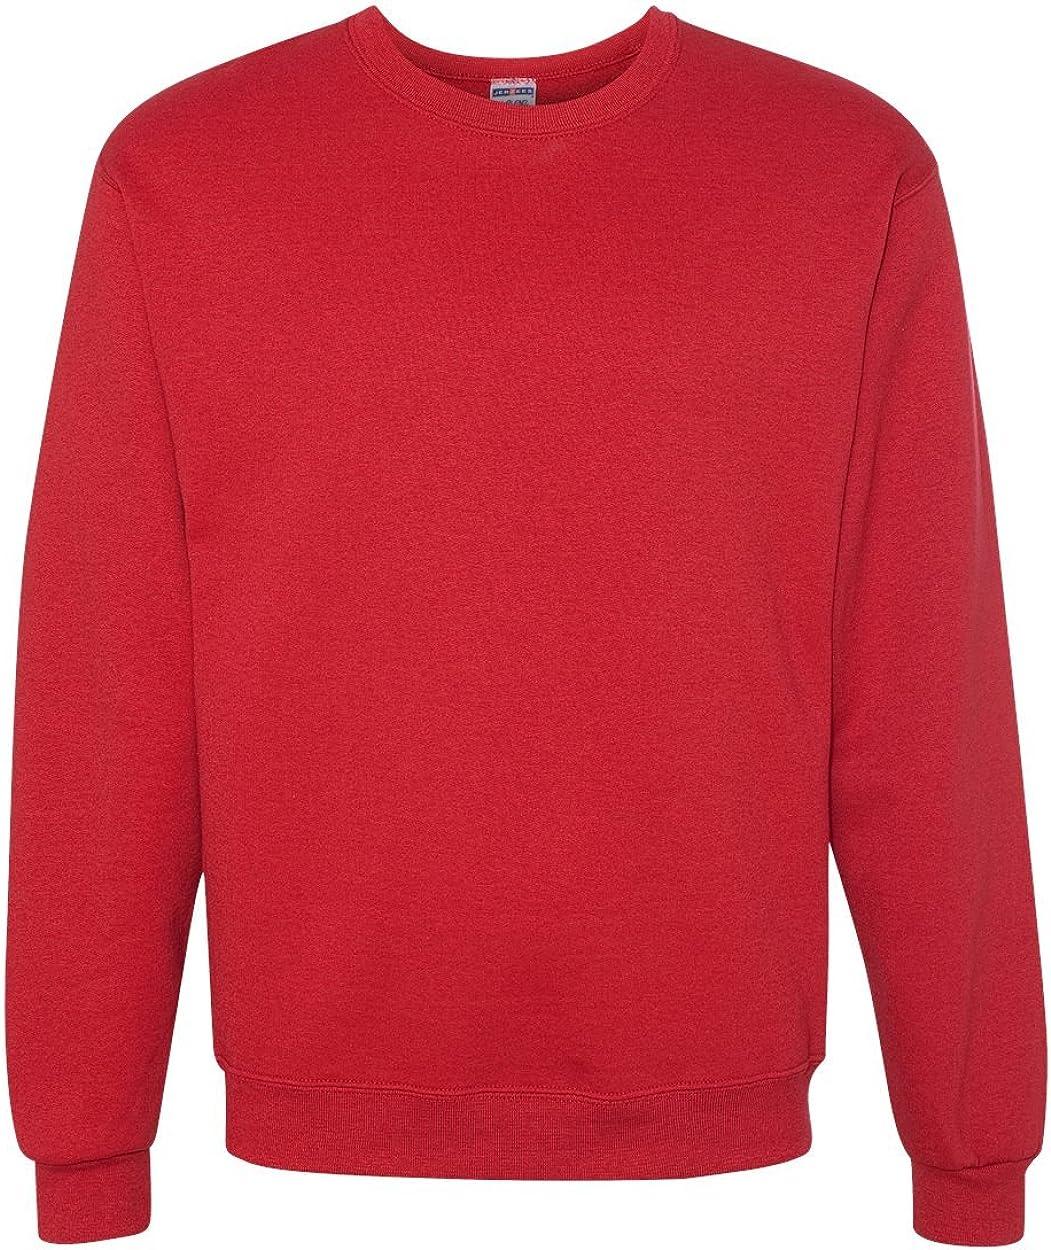 Jerzees Mens Blue Red NuBlend Crewneck Sweatshirt 3X 2X XL Pullover Sweater